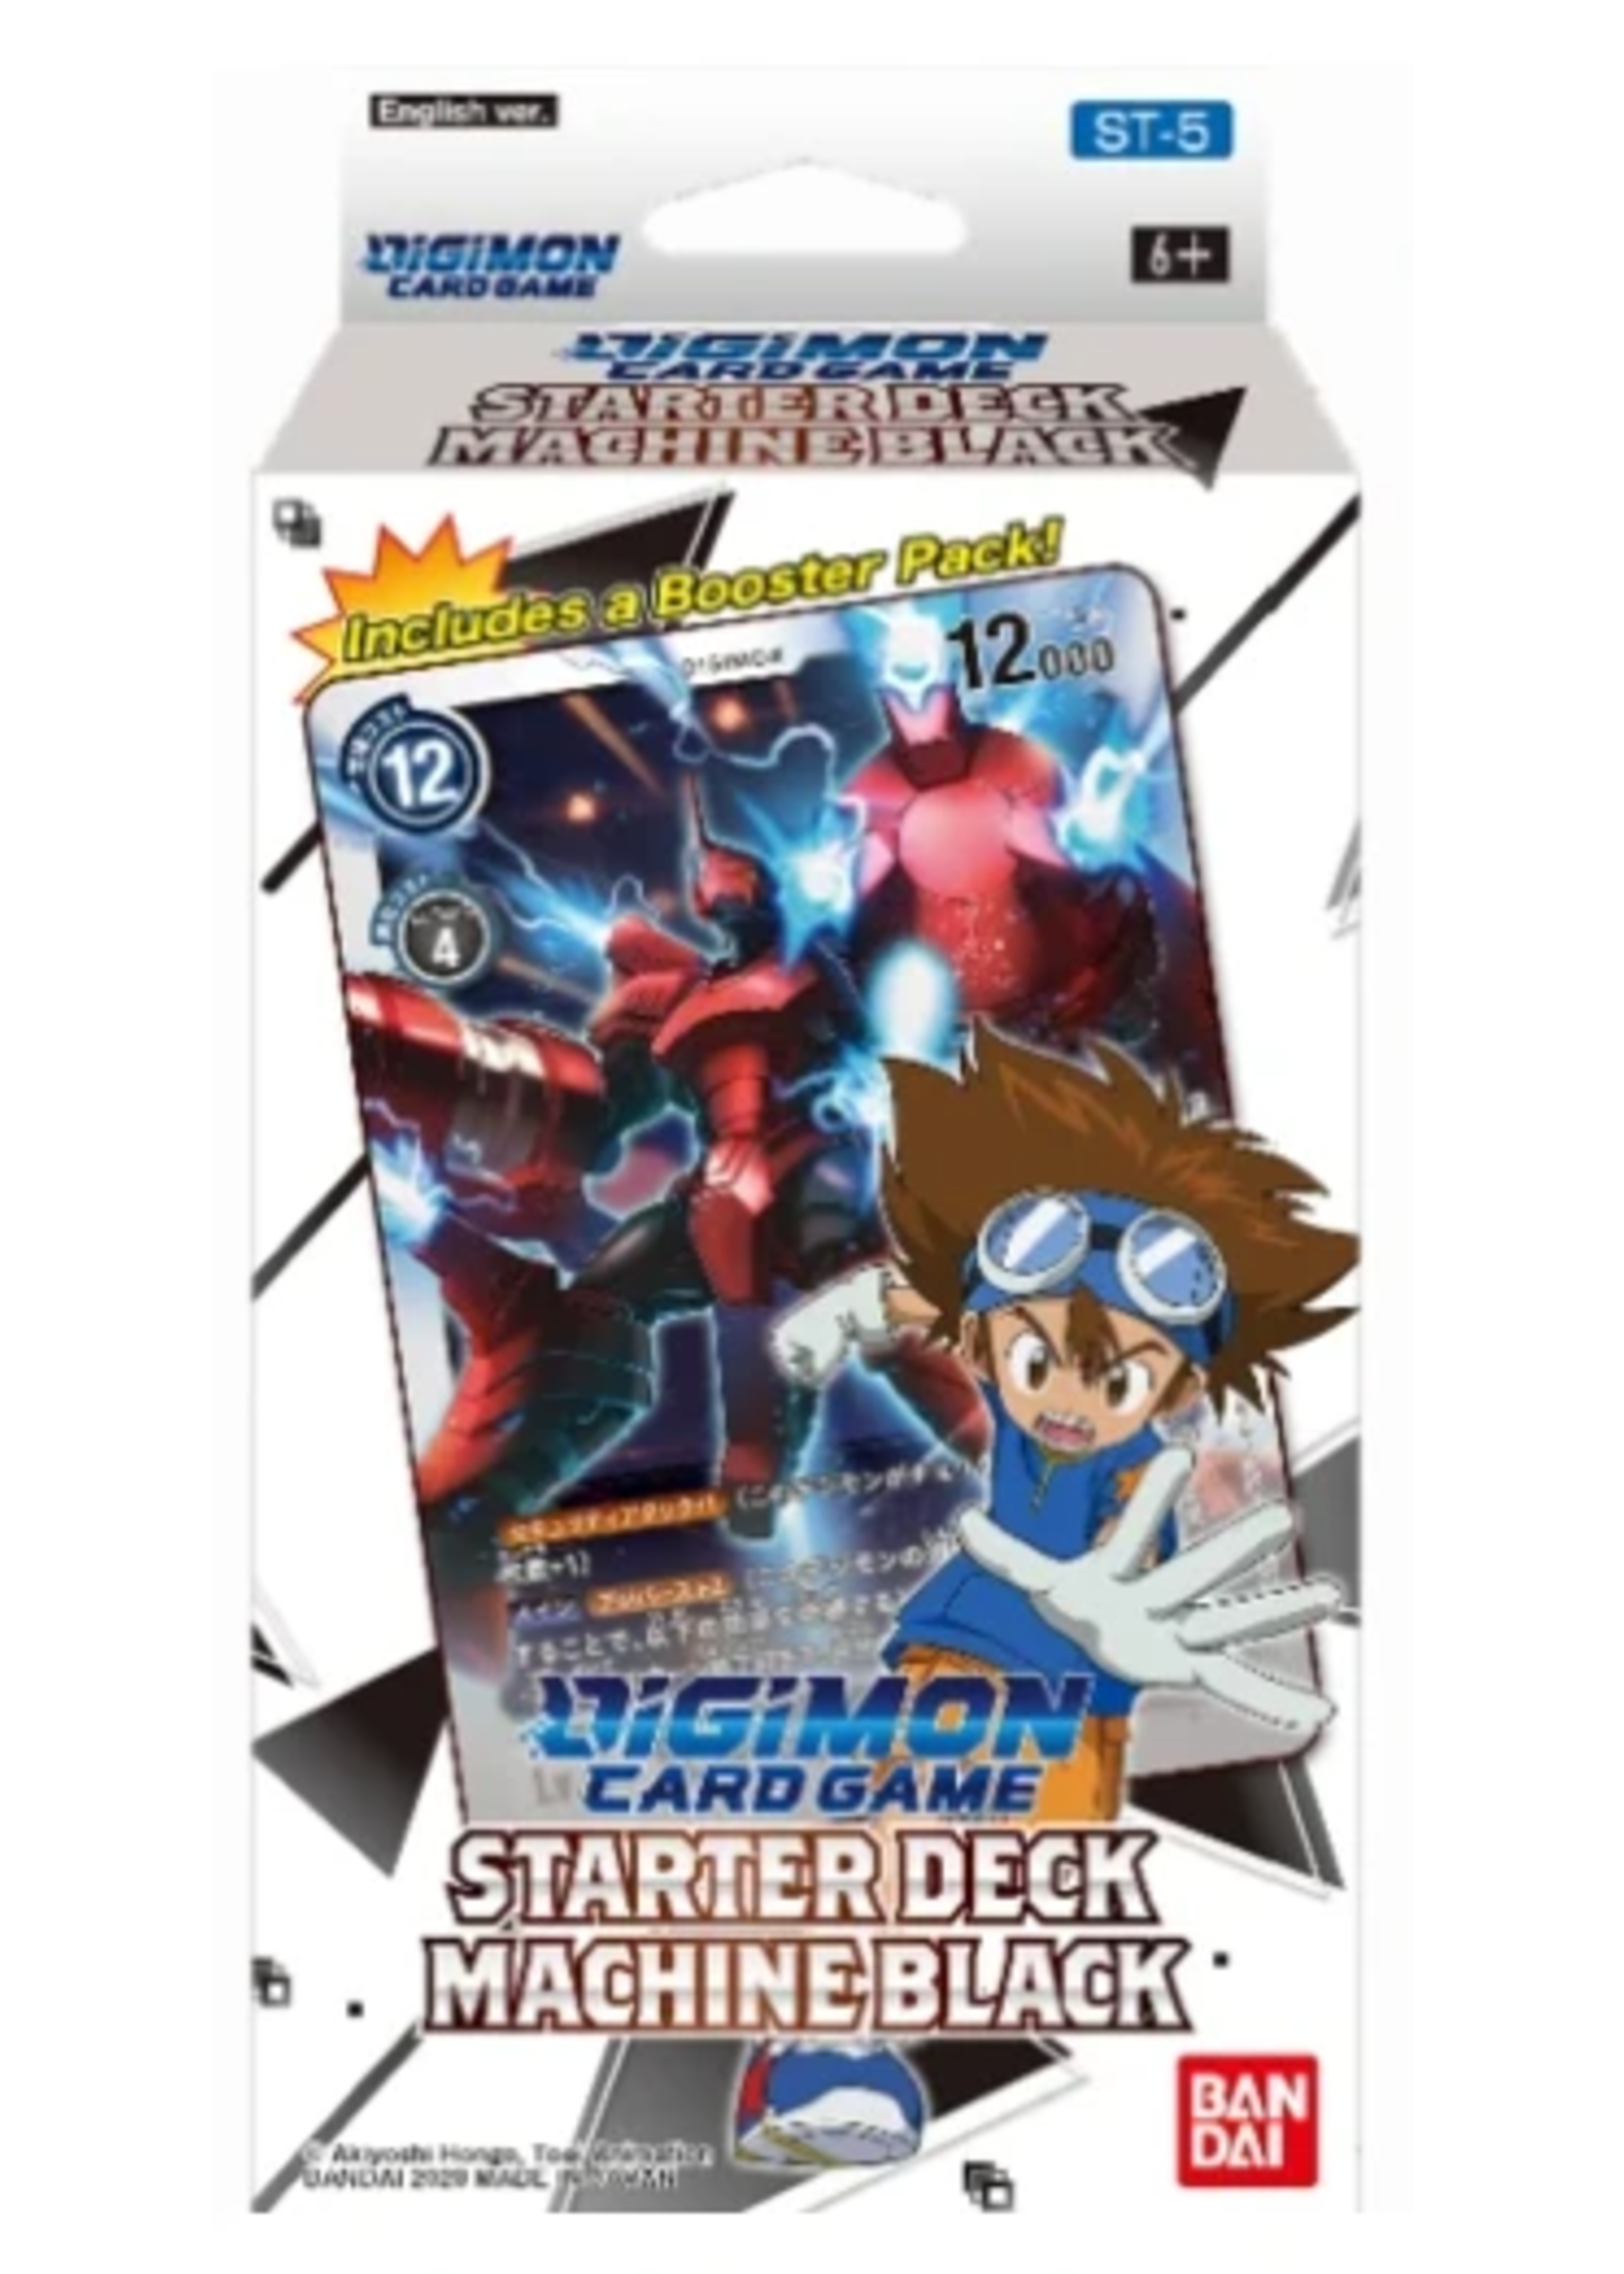 Digimon Card Game - Starter Deck Display Machine Black ST-5